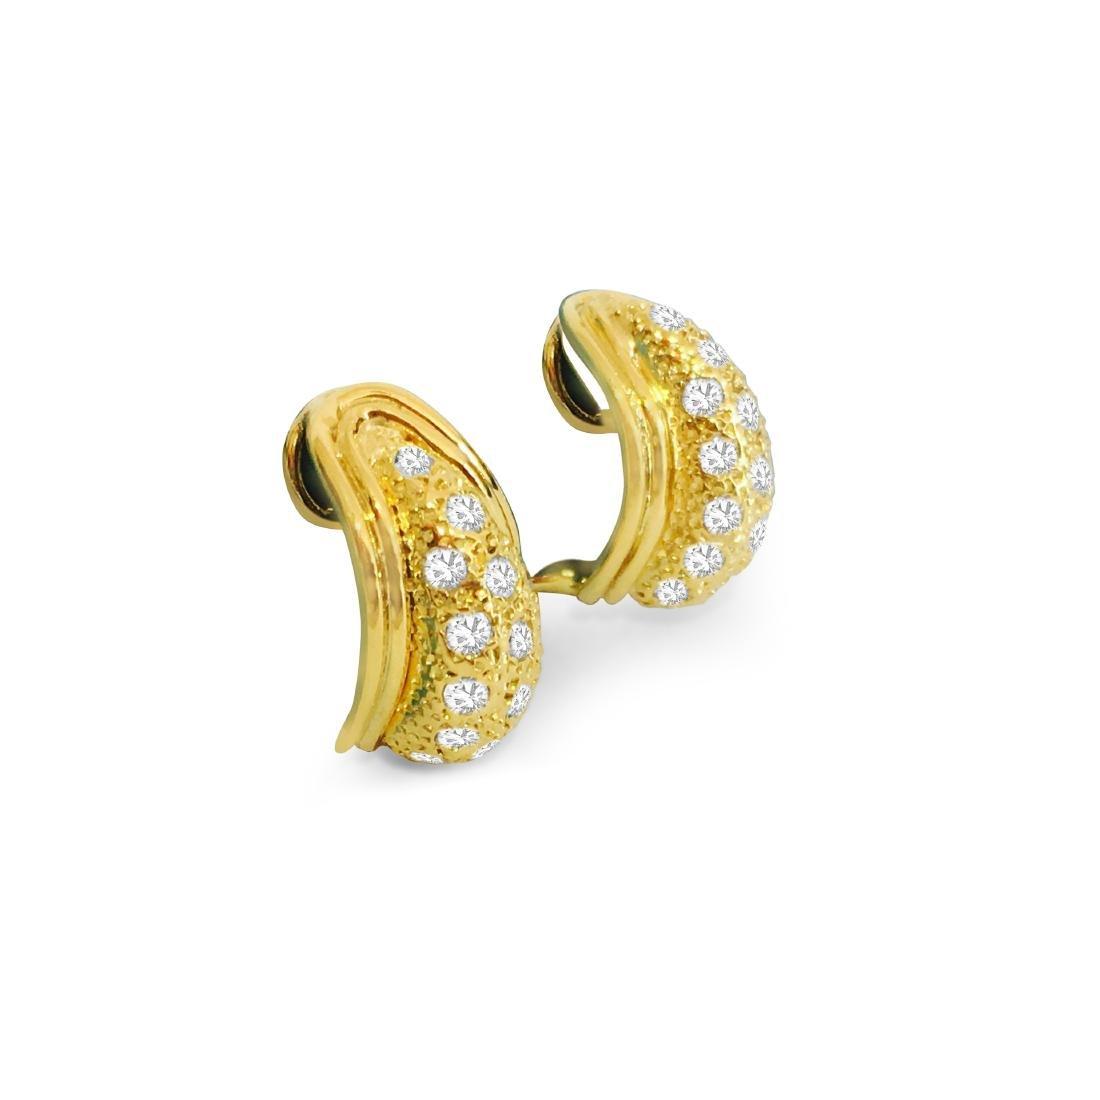 14K Yellow Gold, 1.00 CT Diamond Earrings - 2